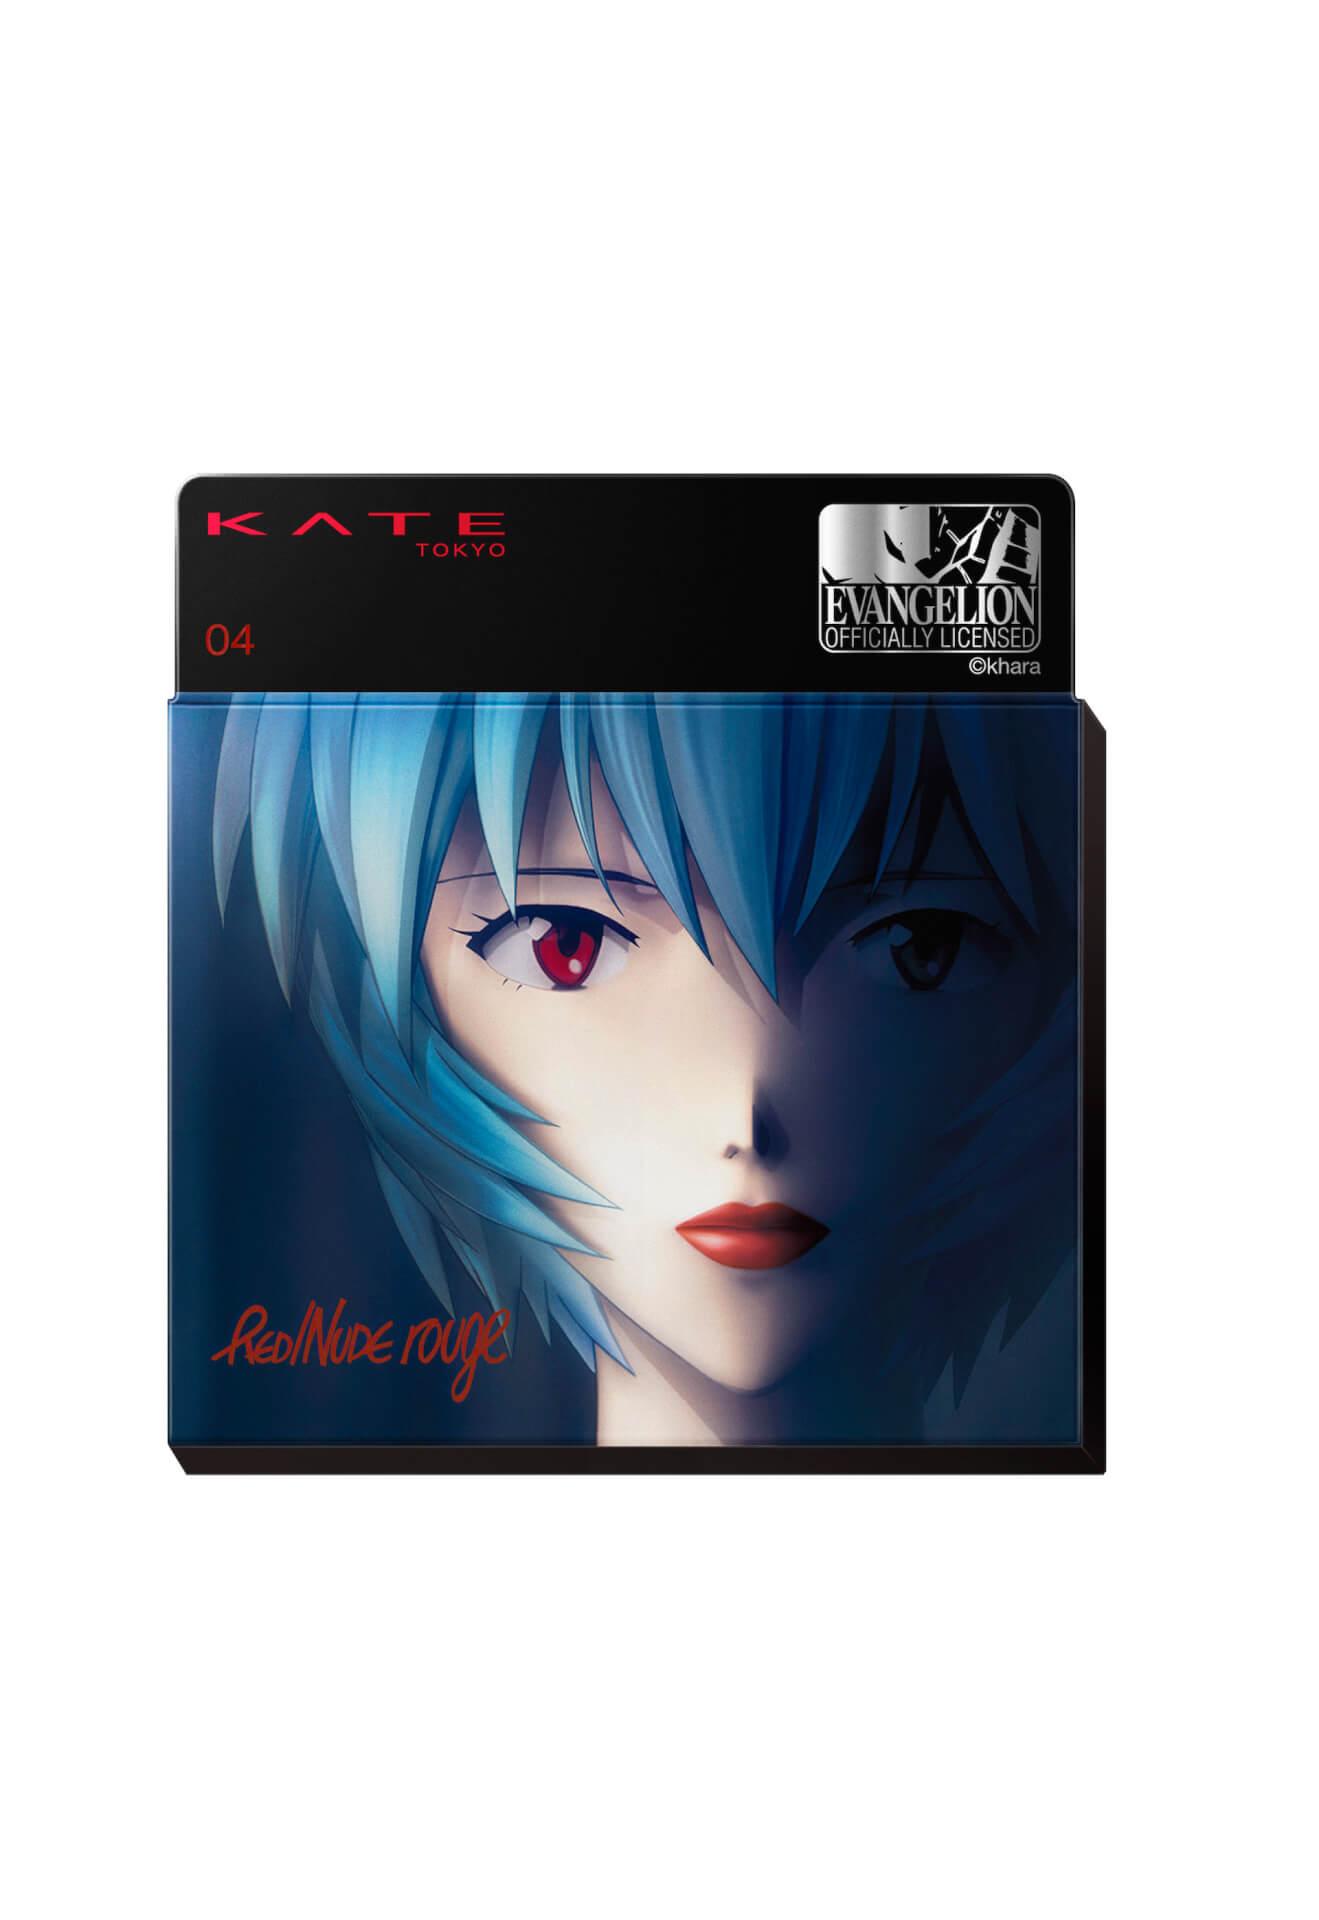 KATEが『エヴァンゲリオン』とコラボ!見たことのない綾波レイの姿が描かれた限定パッケージ発売決定 art201008_eva_kate_13